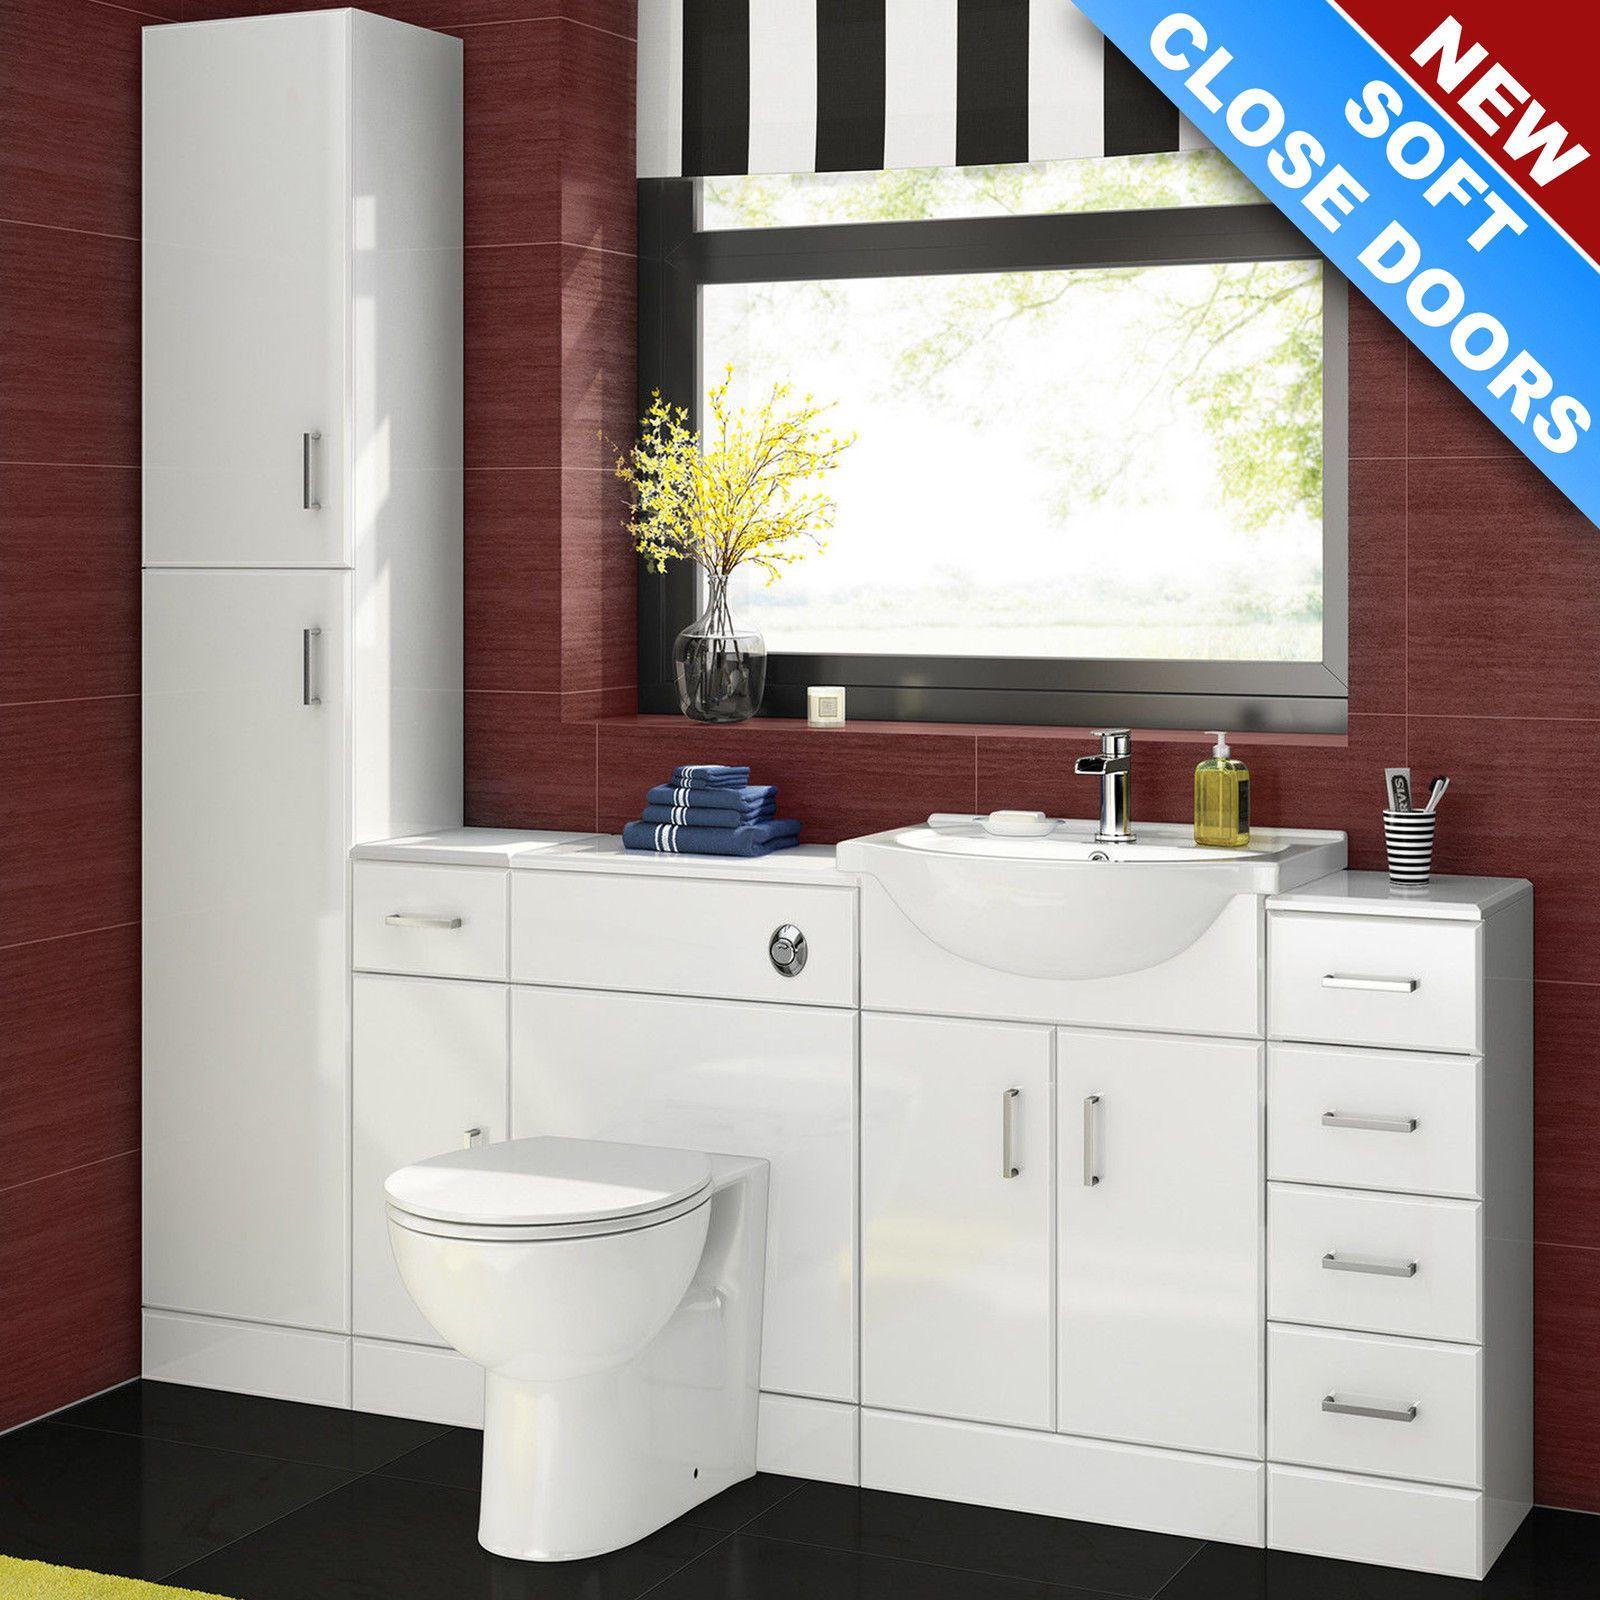 Complete Bathroom Suite | White Combination Storage Basin Vanity ...